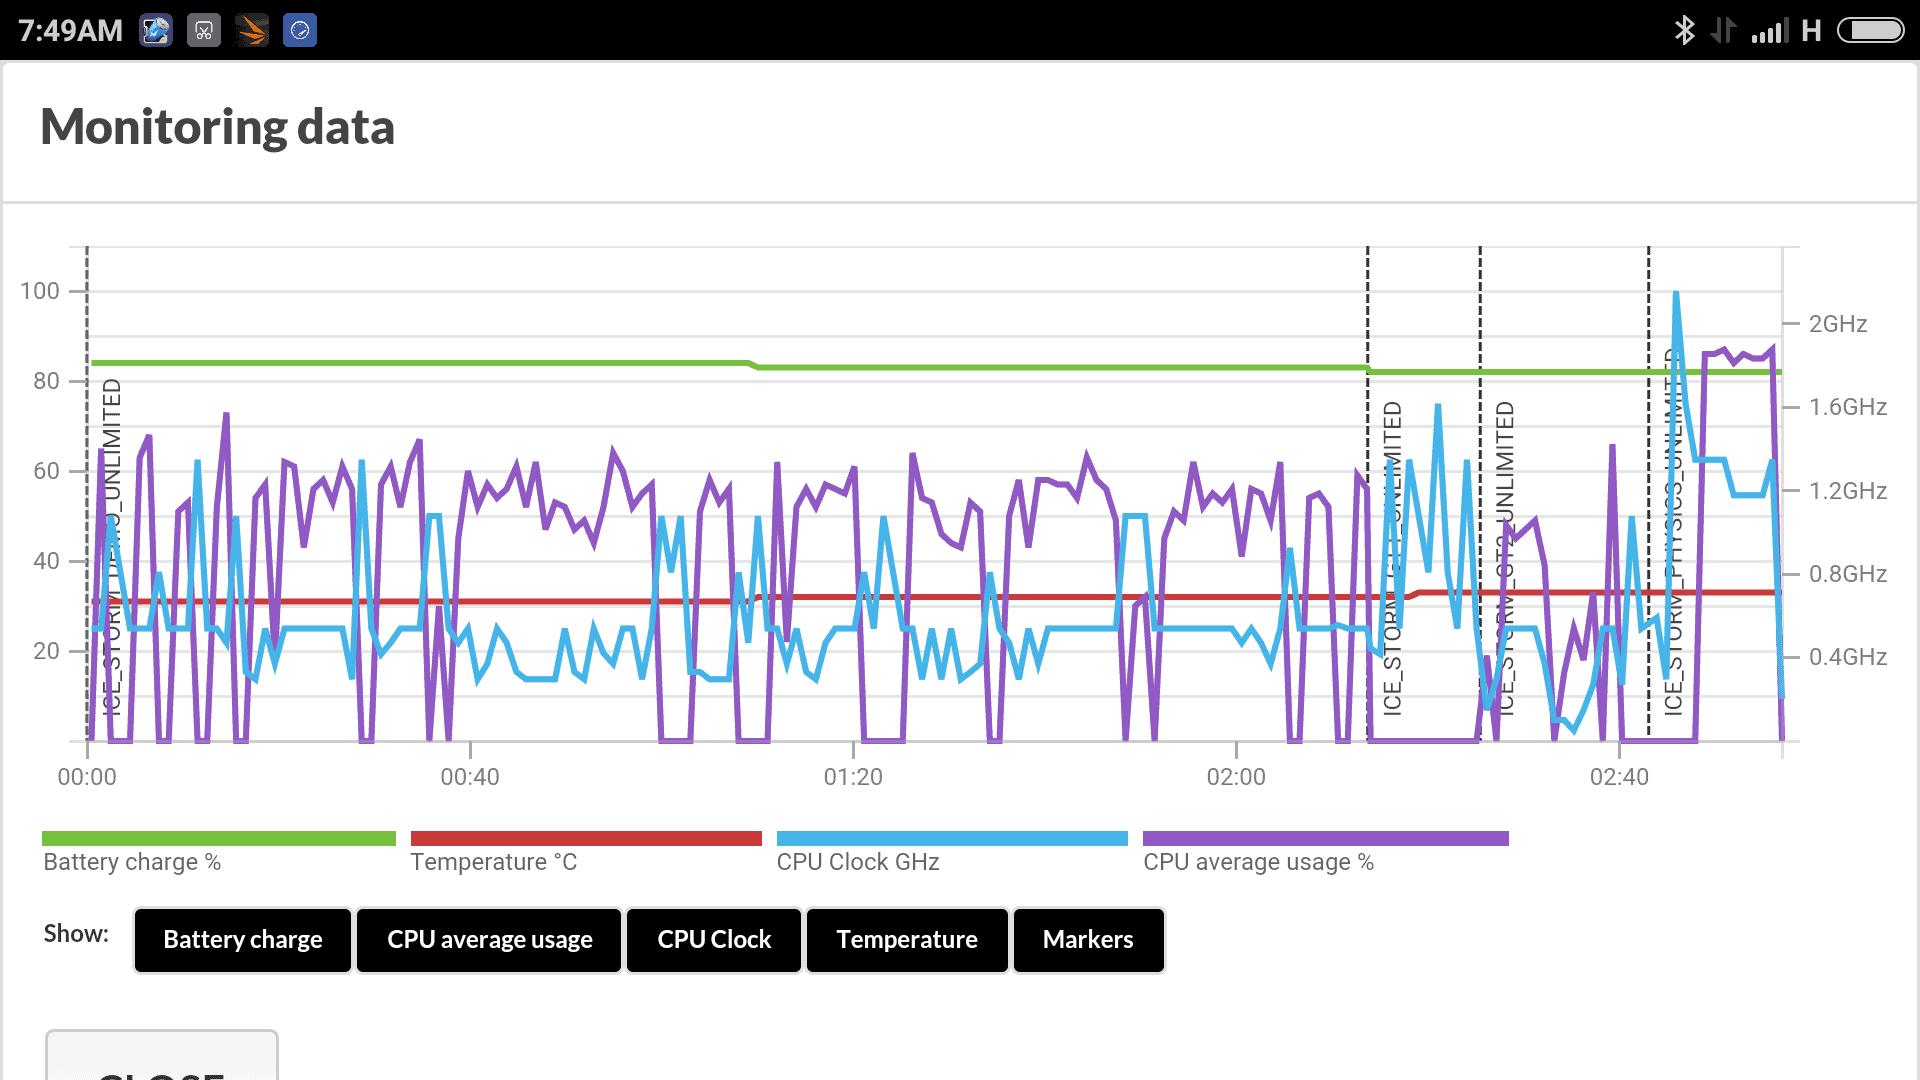 Xiaomi Redmi Note 2 AH benchmarks 08